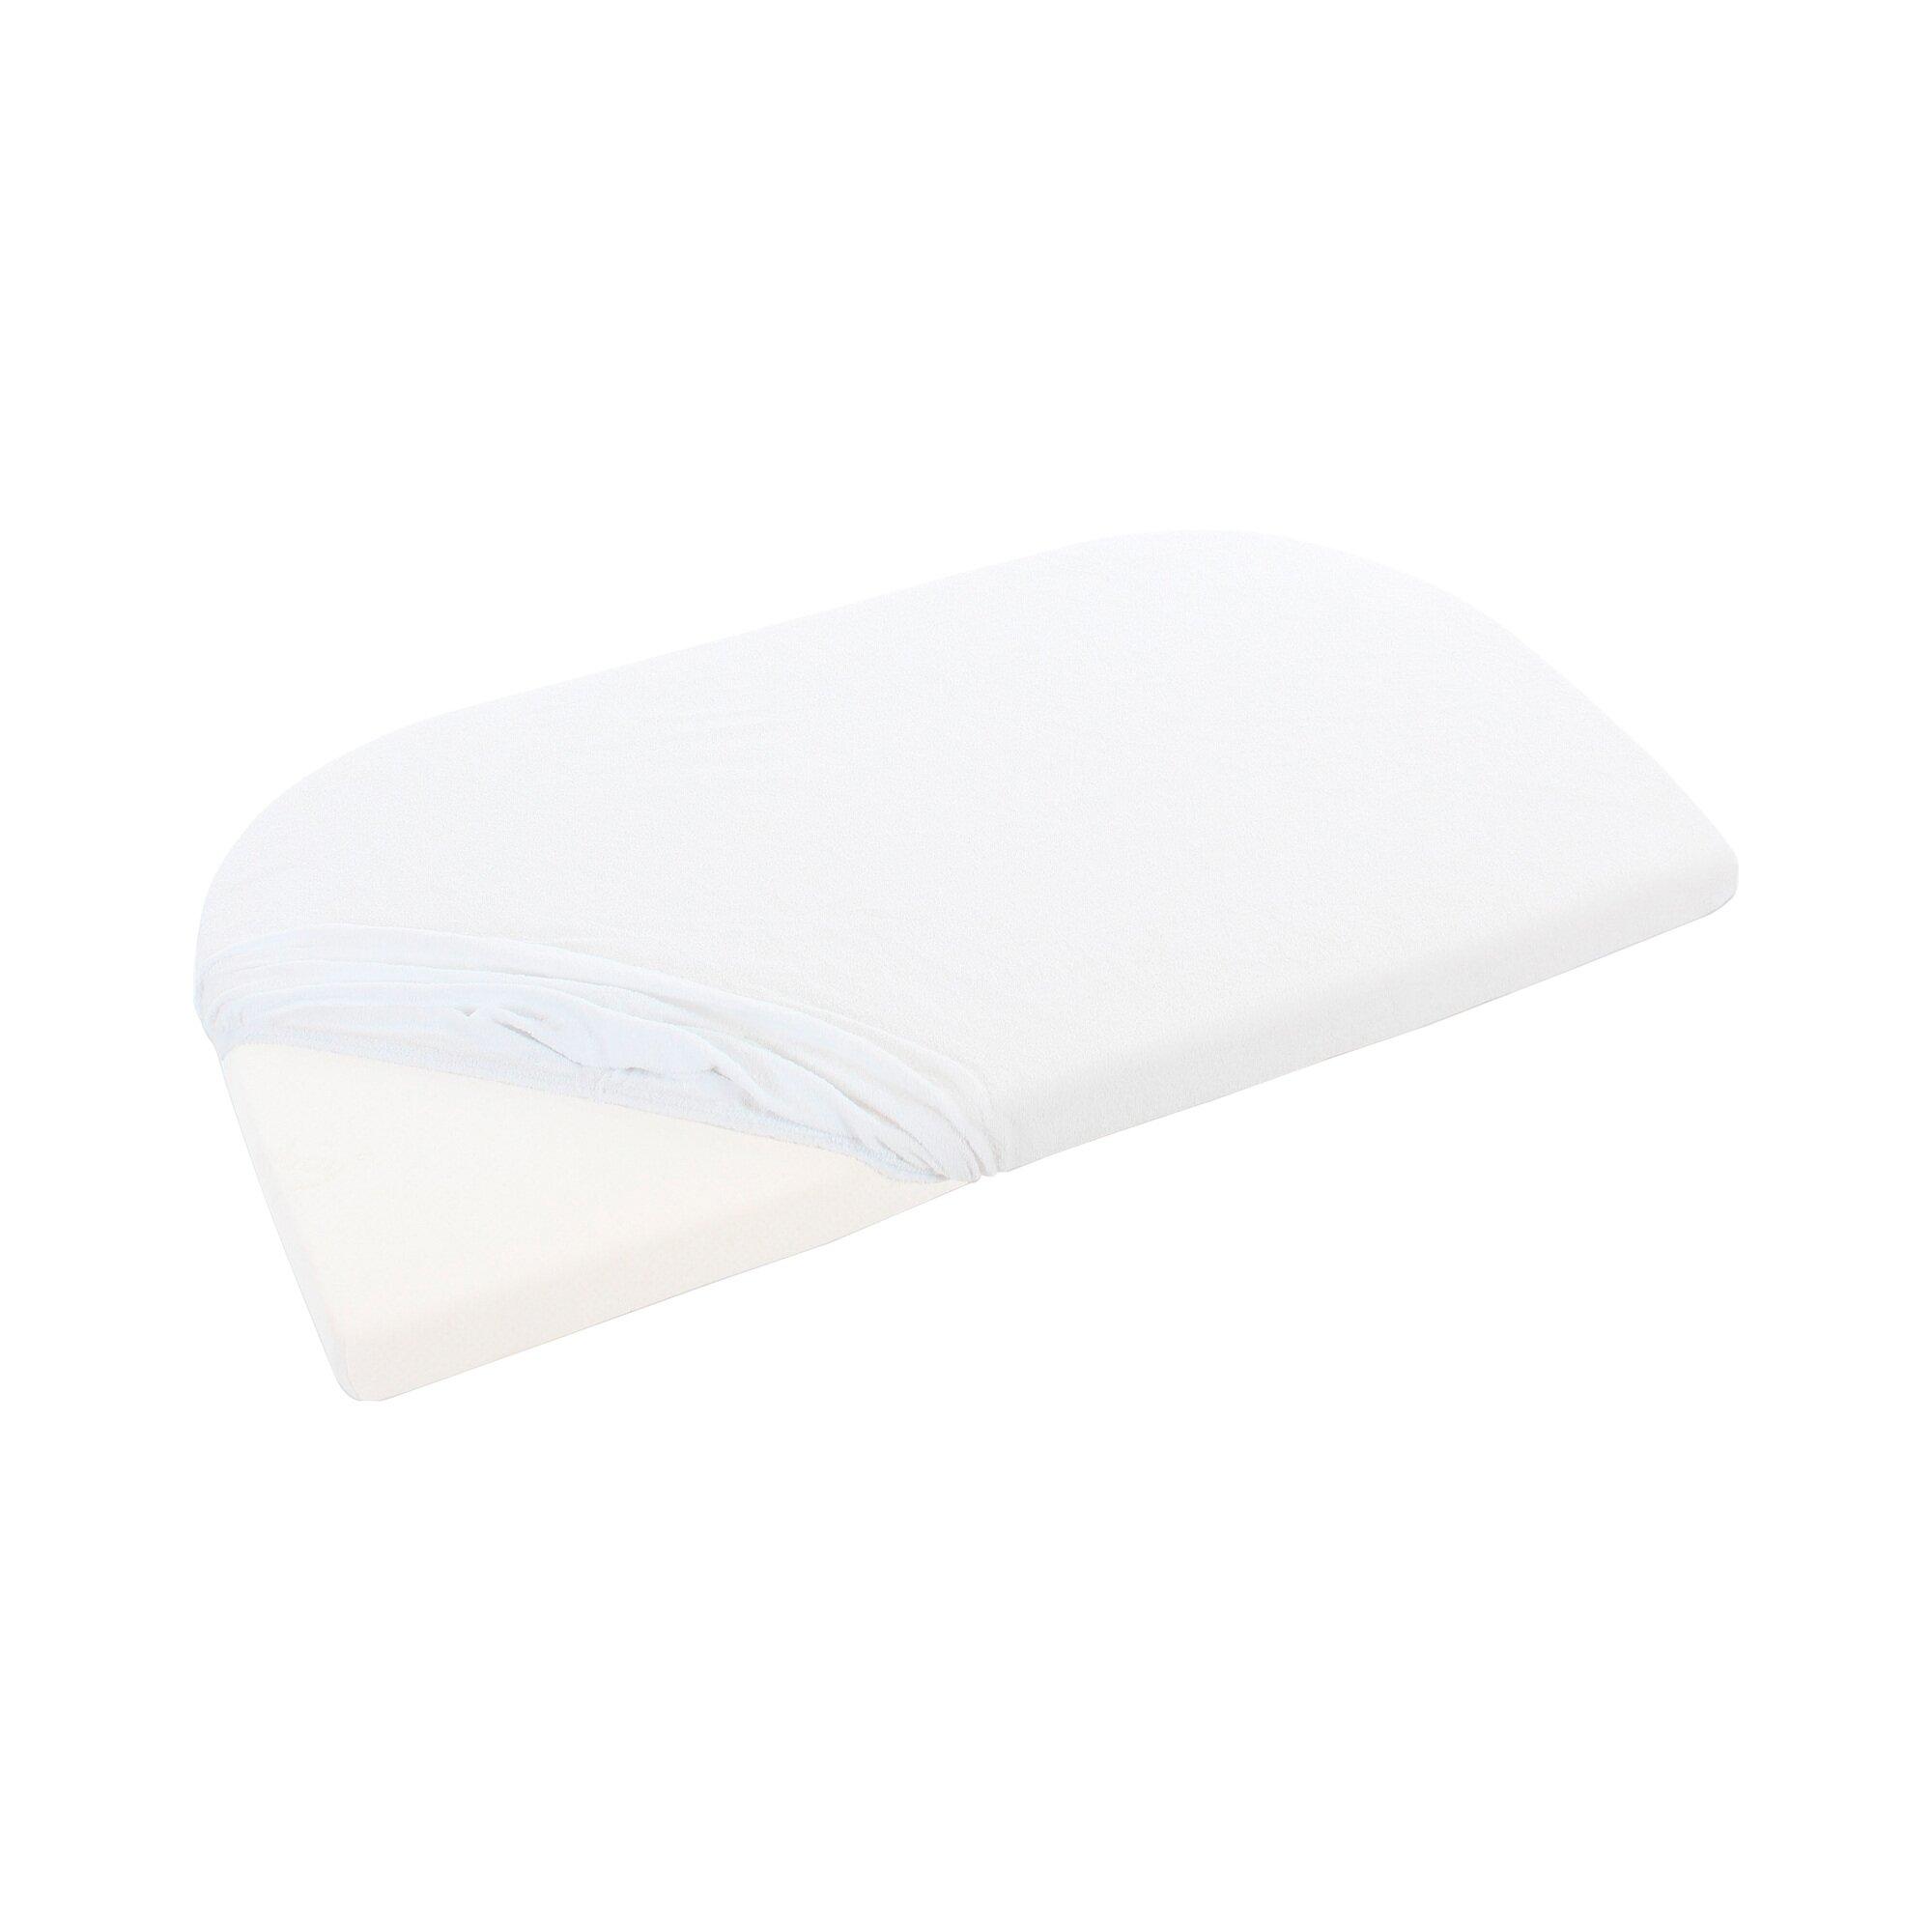 Babybay® Frottee-Spannbetttuch Original 81x42 cm weiss